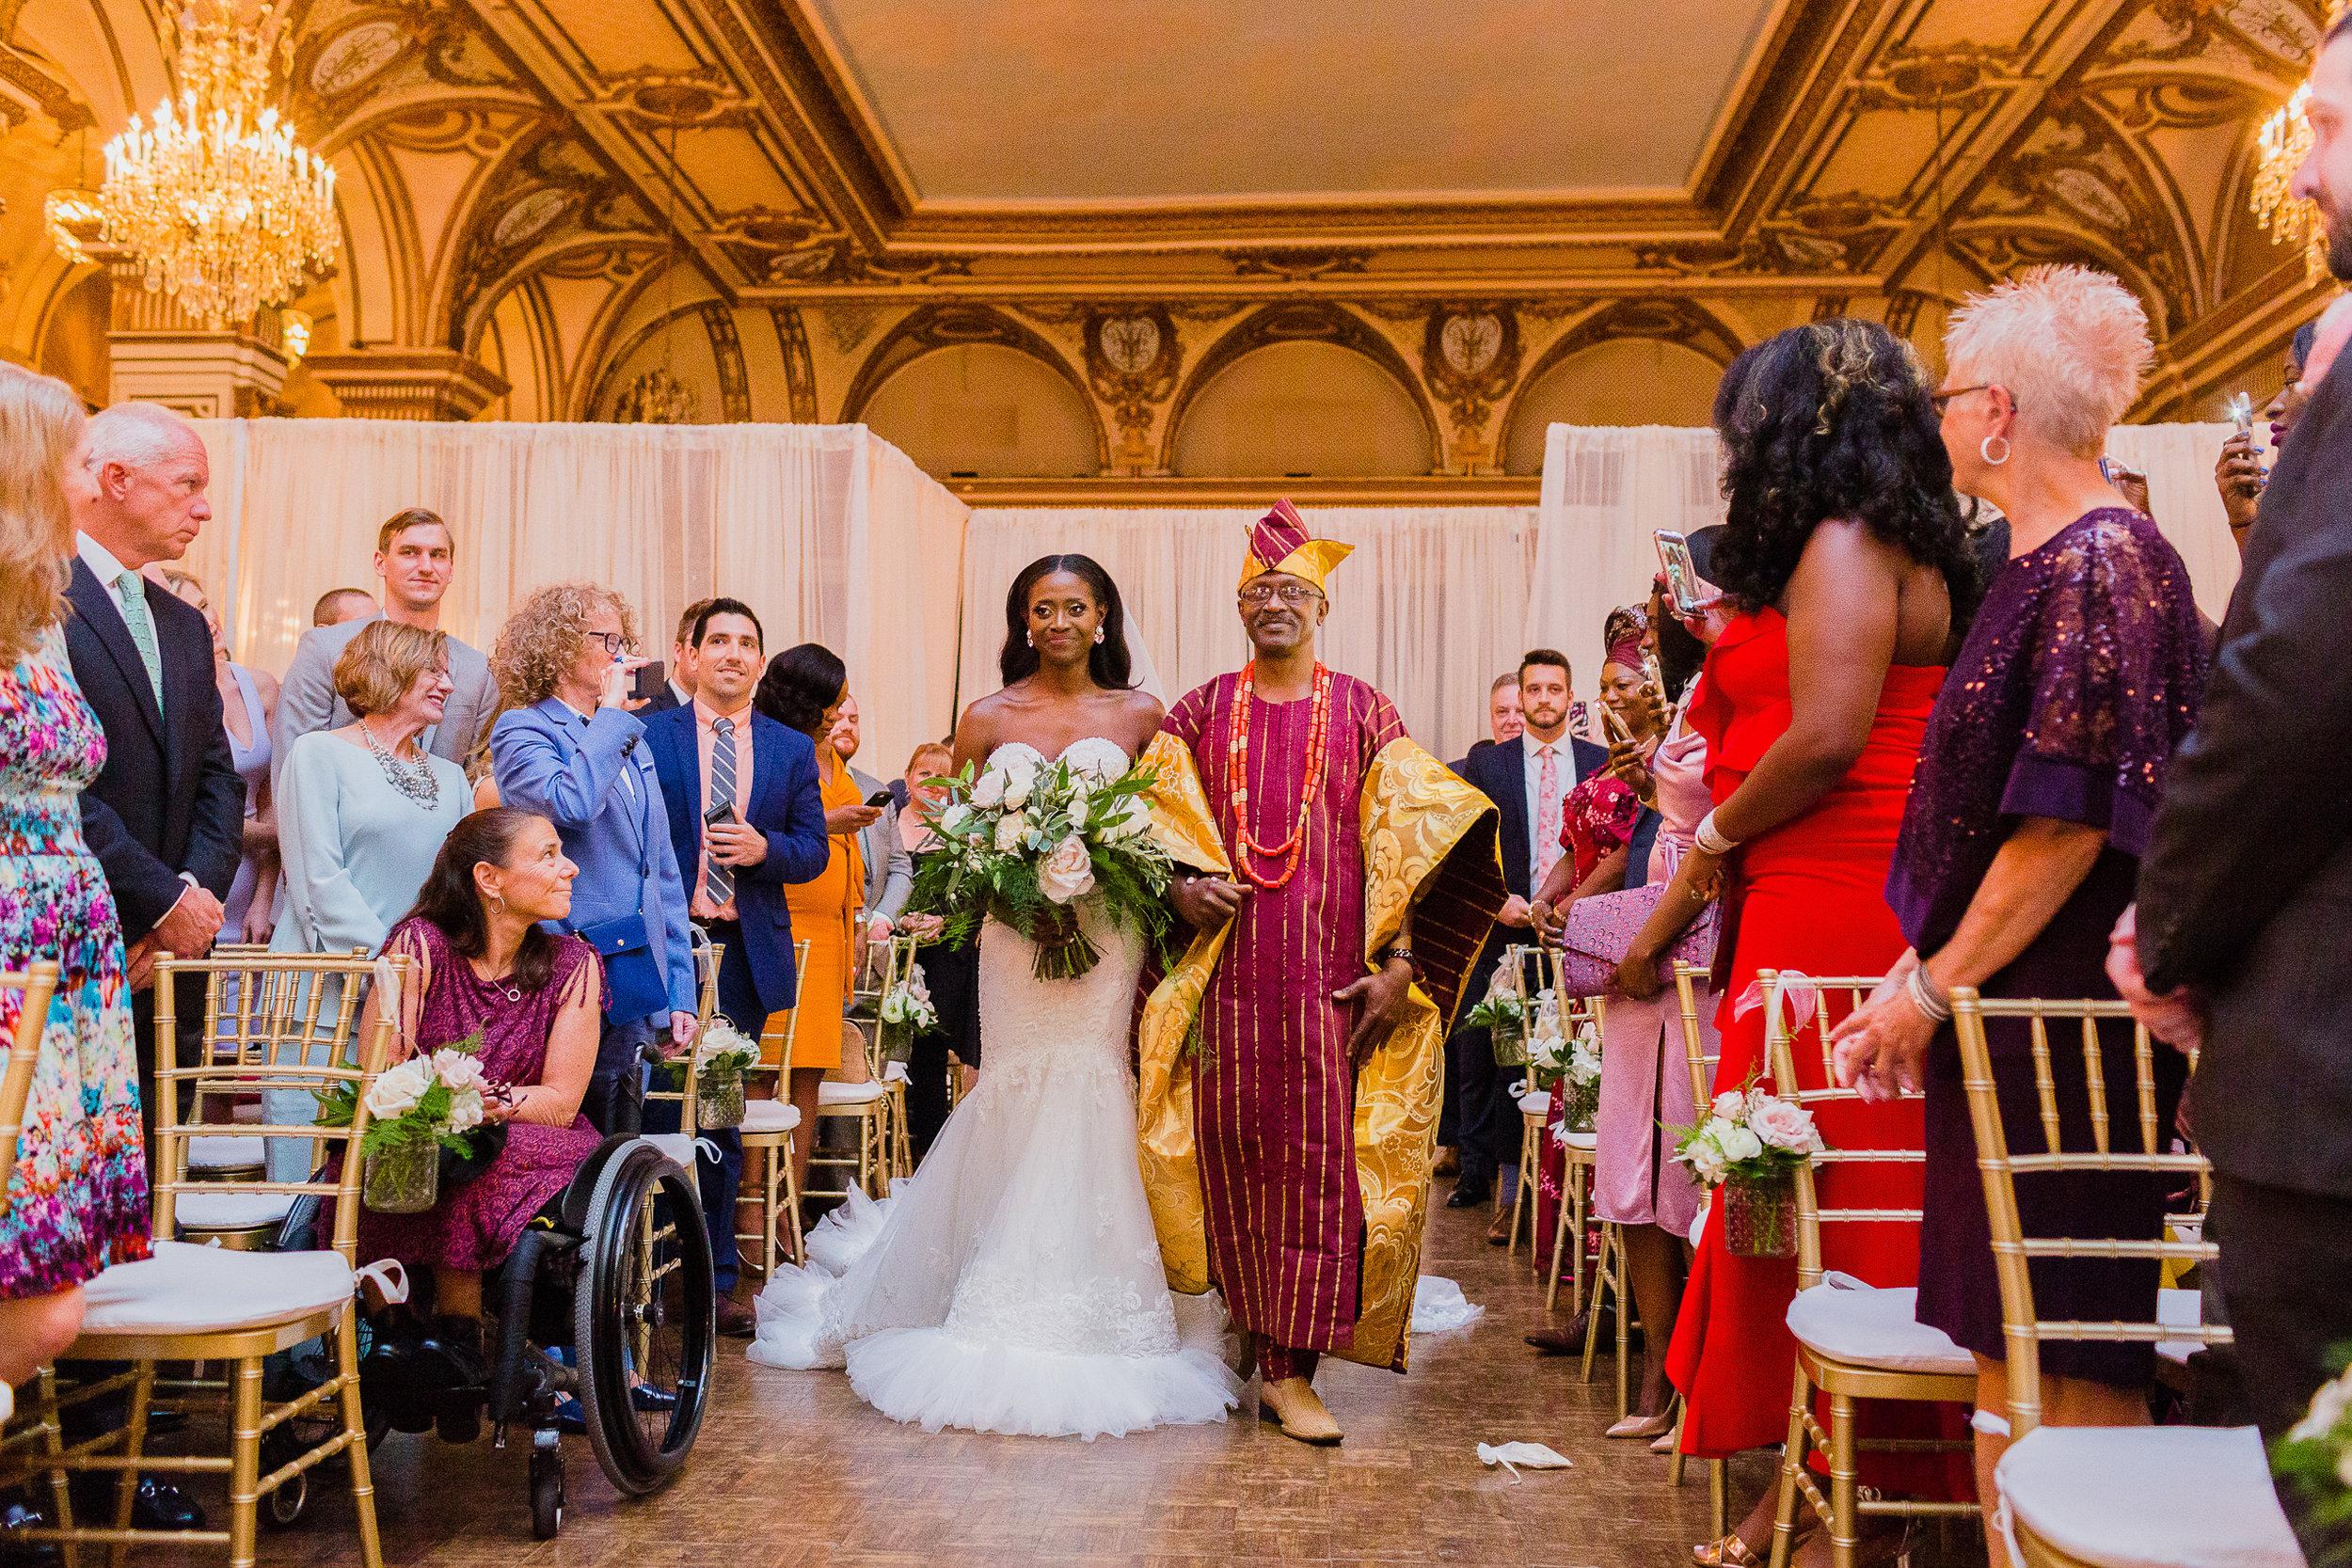 fairmont-copley-plaza-wedding-photos-00735.JPG